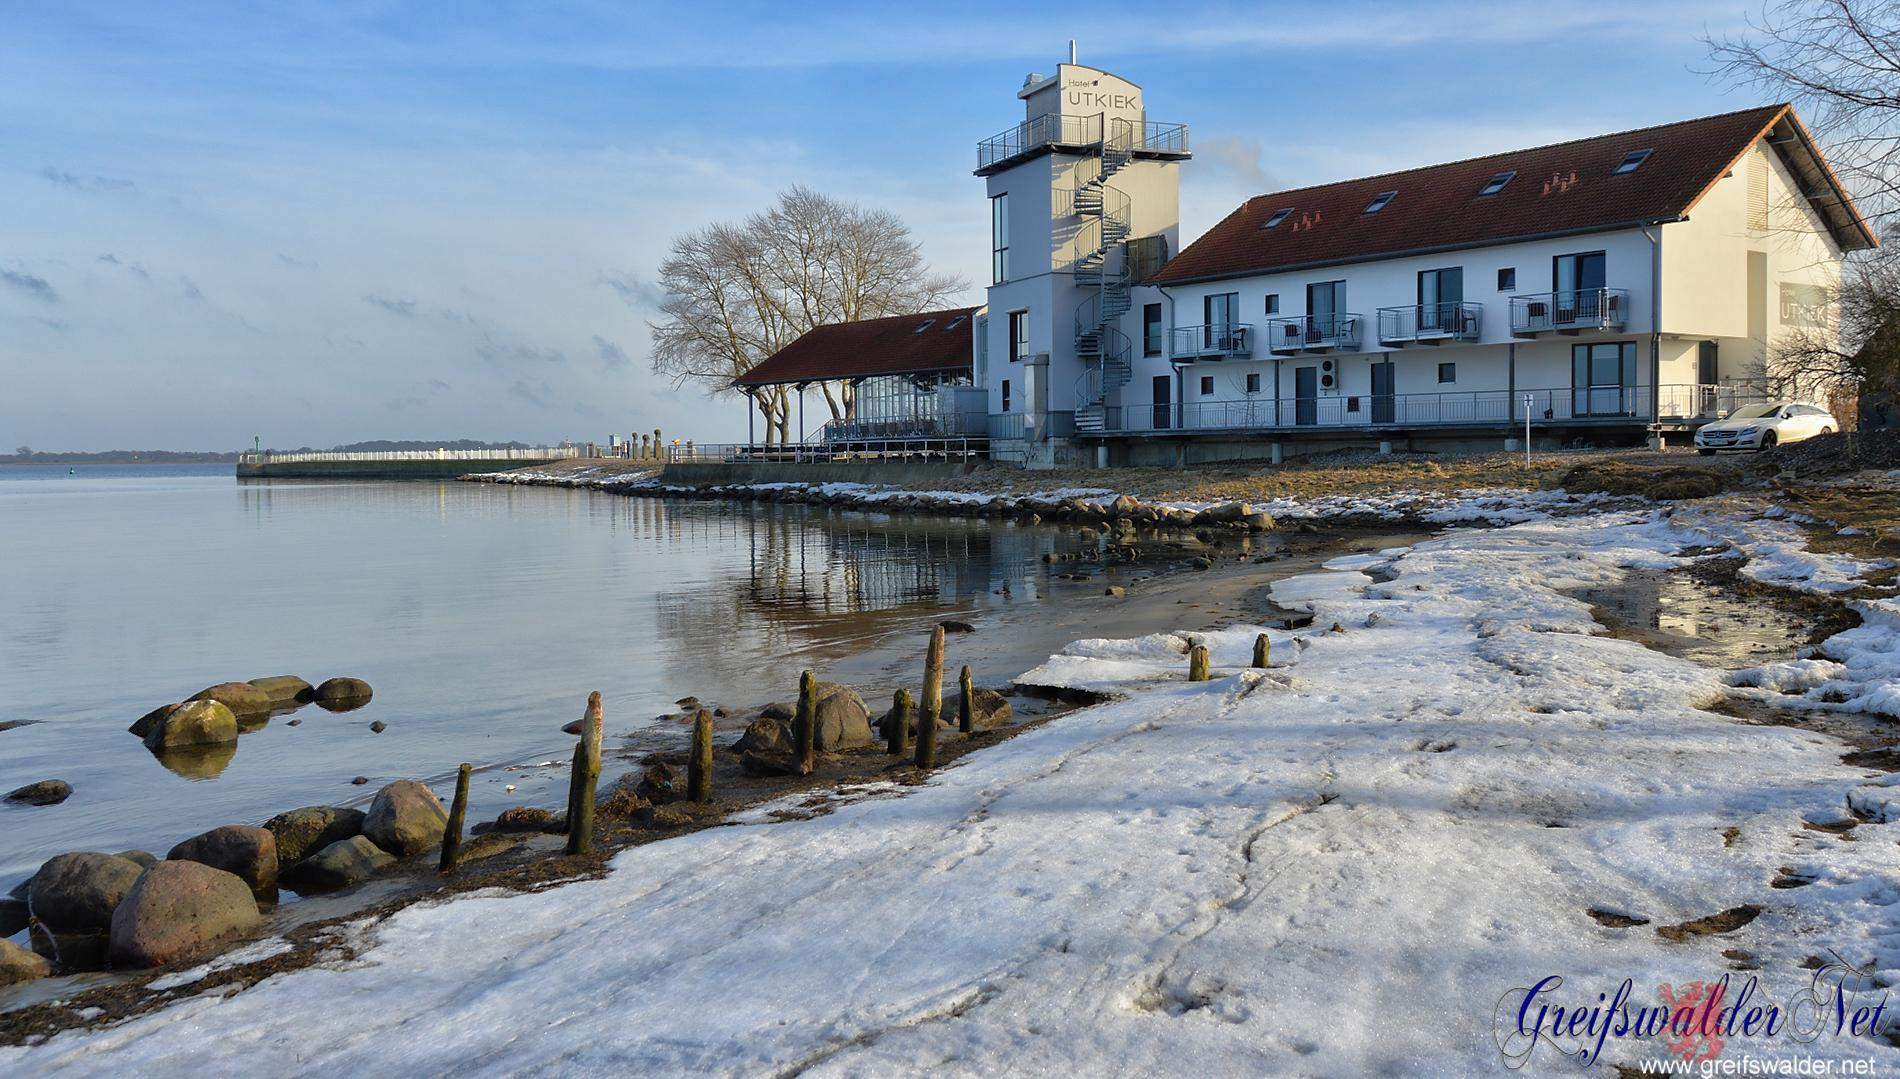 Winterwetter am Utkiek in Greifswald-Wieck